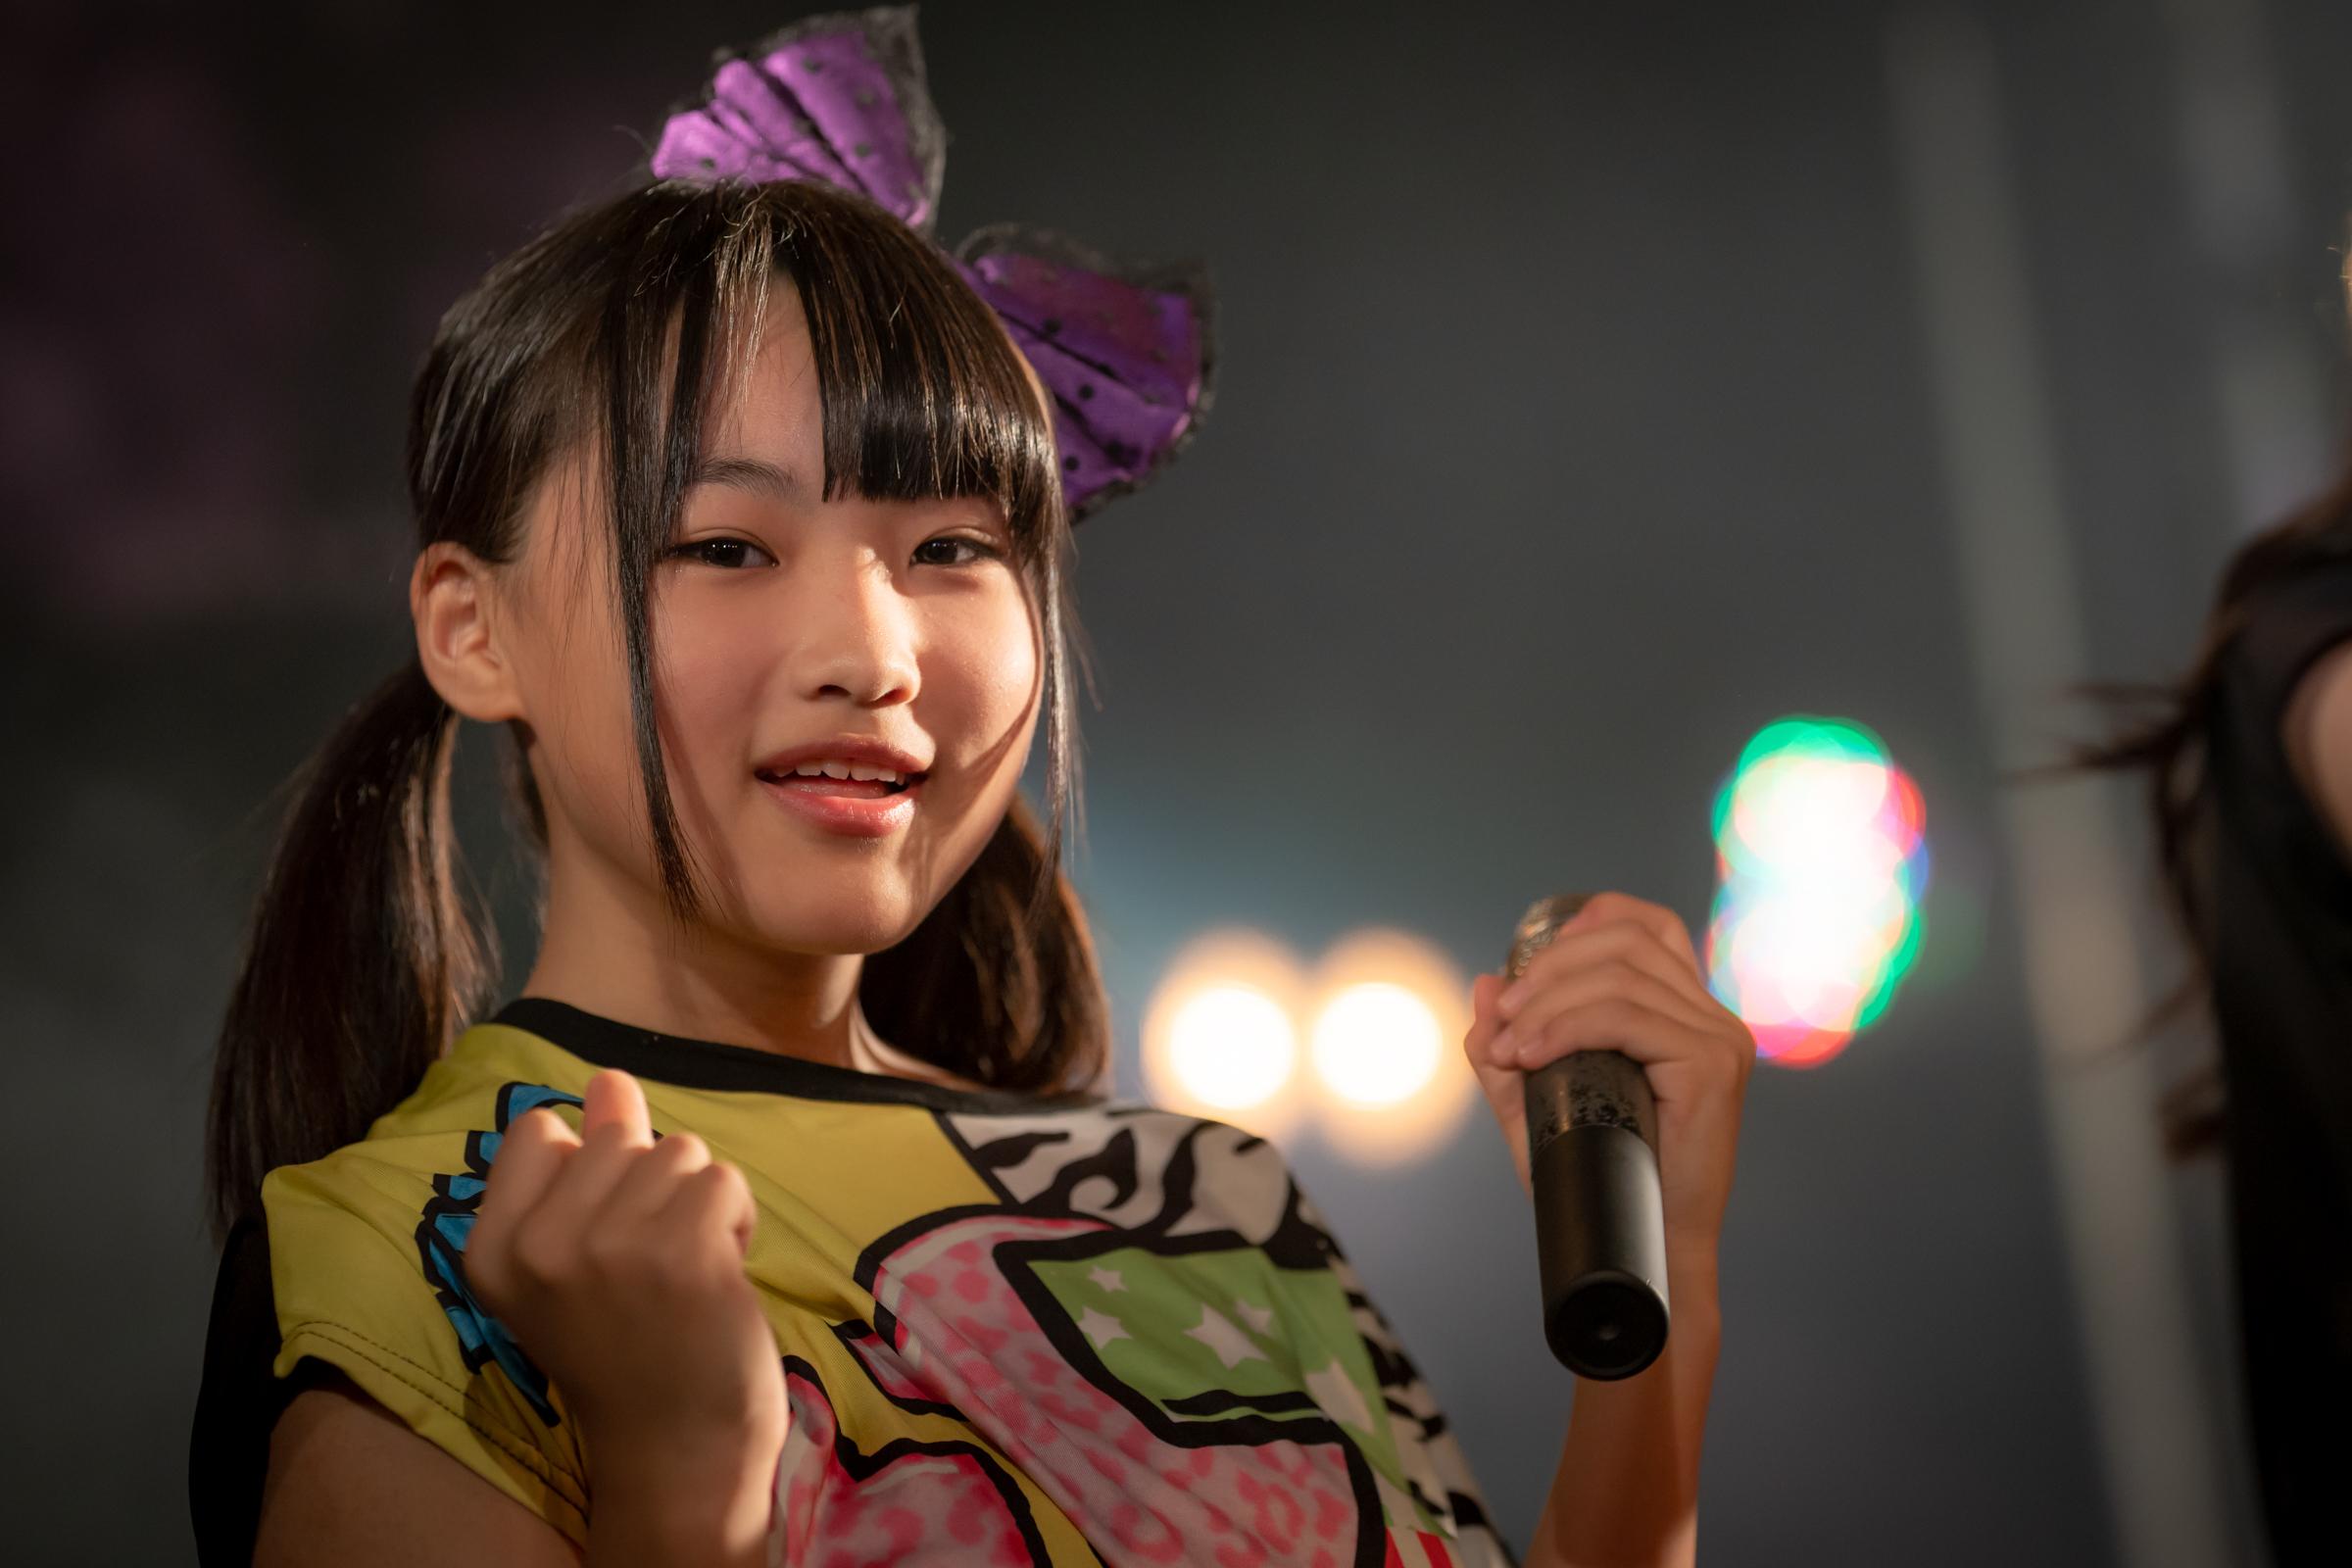 POPPING☆SMILE りん ( 谷本りん ) | フルーティー定期公演フルーツバスケット~おまる生誕~